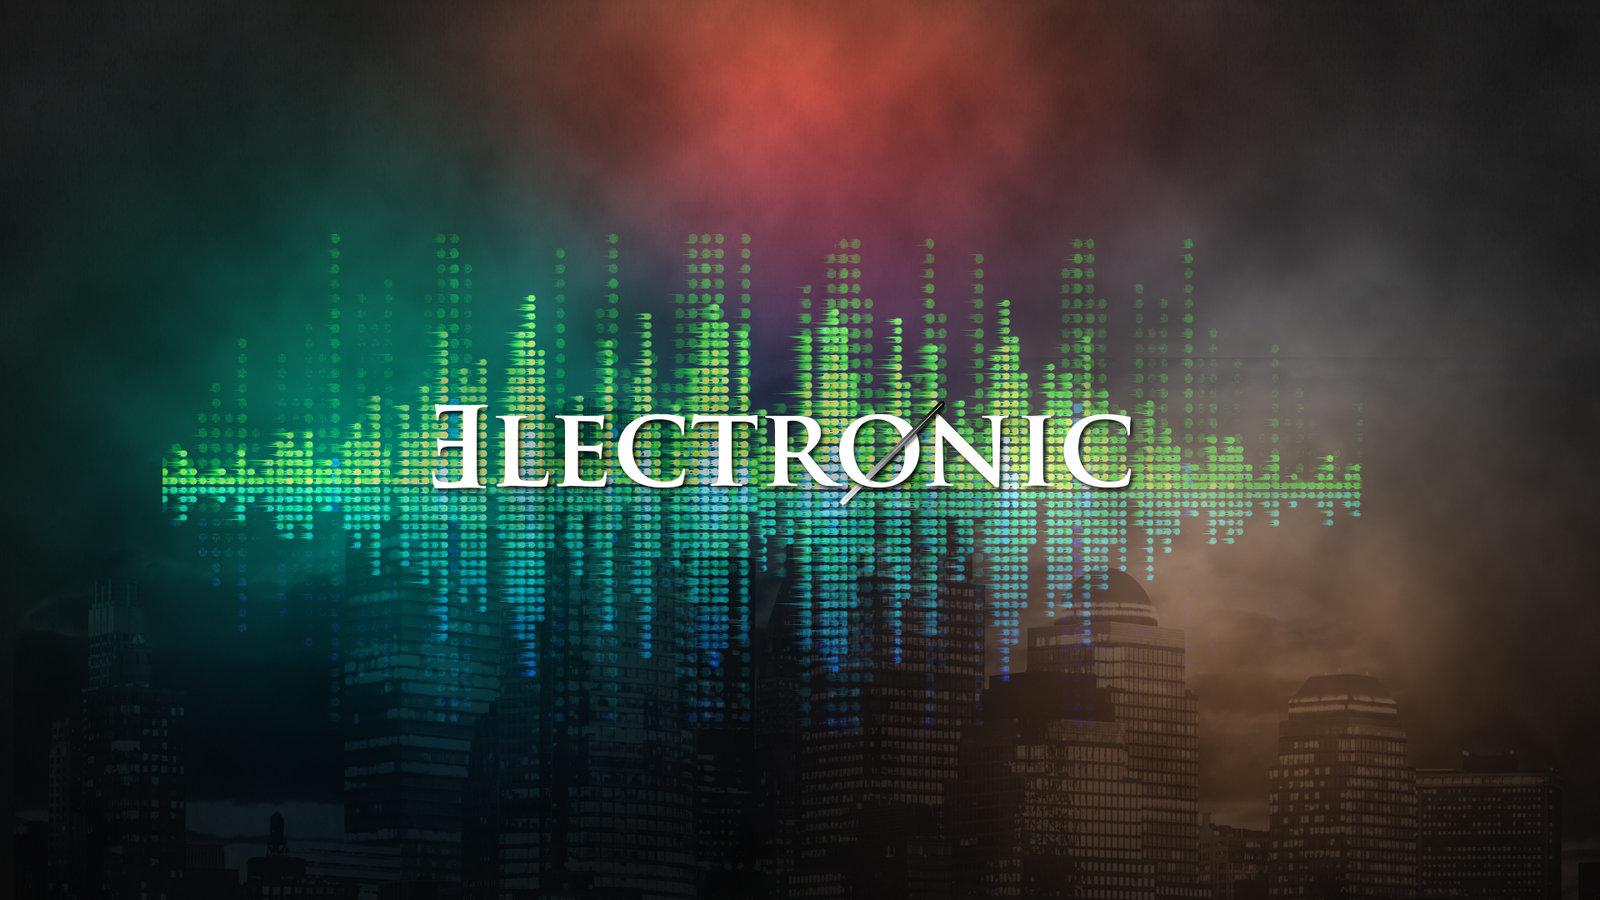 Electronic music wallpaper wallpapersafari for Acid electronic music